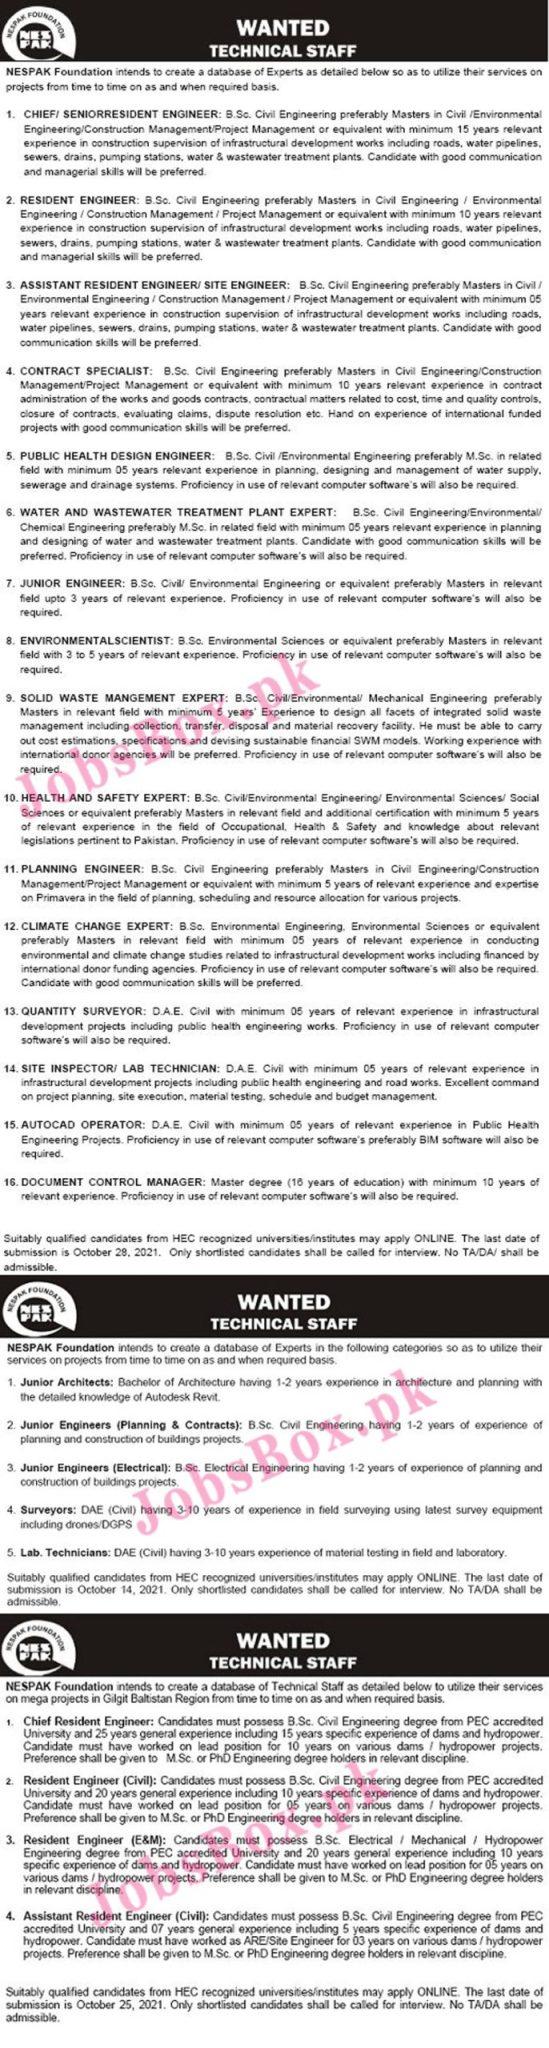 http://nespakfoundation.com.pk/Careers.html - NESPAK National Engineering Services Pakistan Jobs 2021 in Pakistan